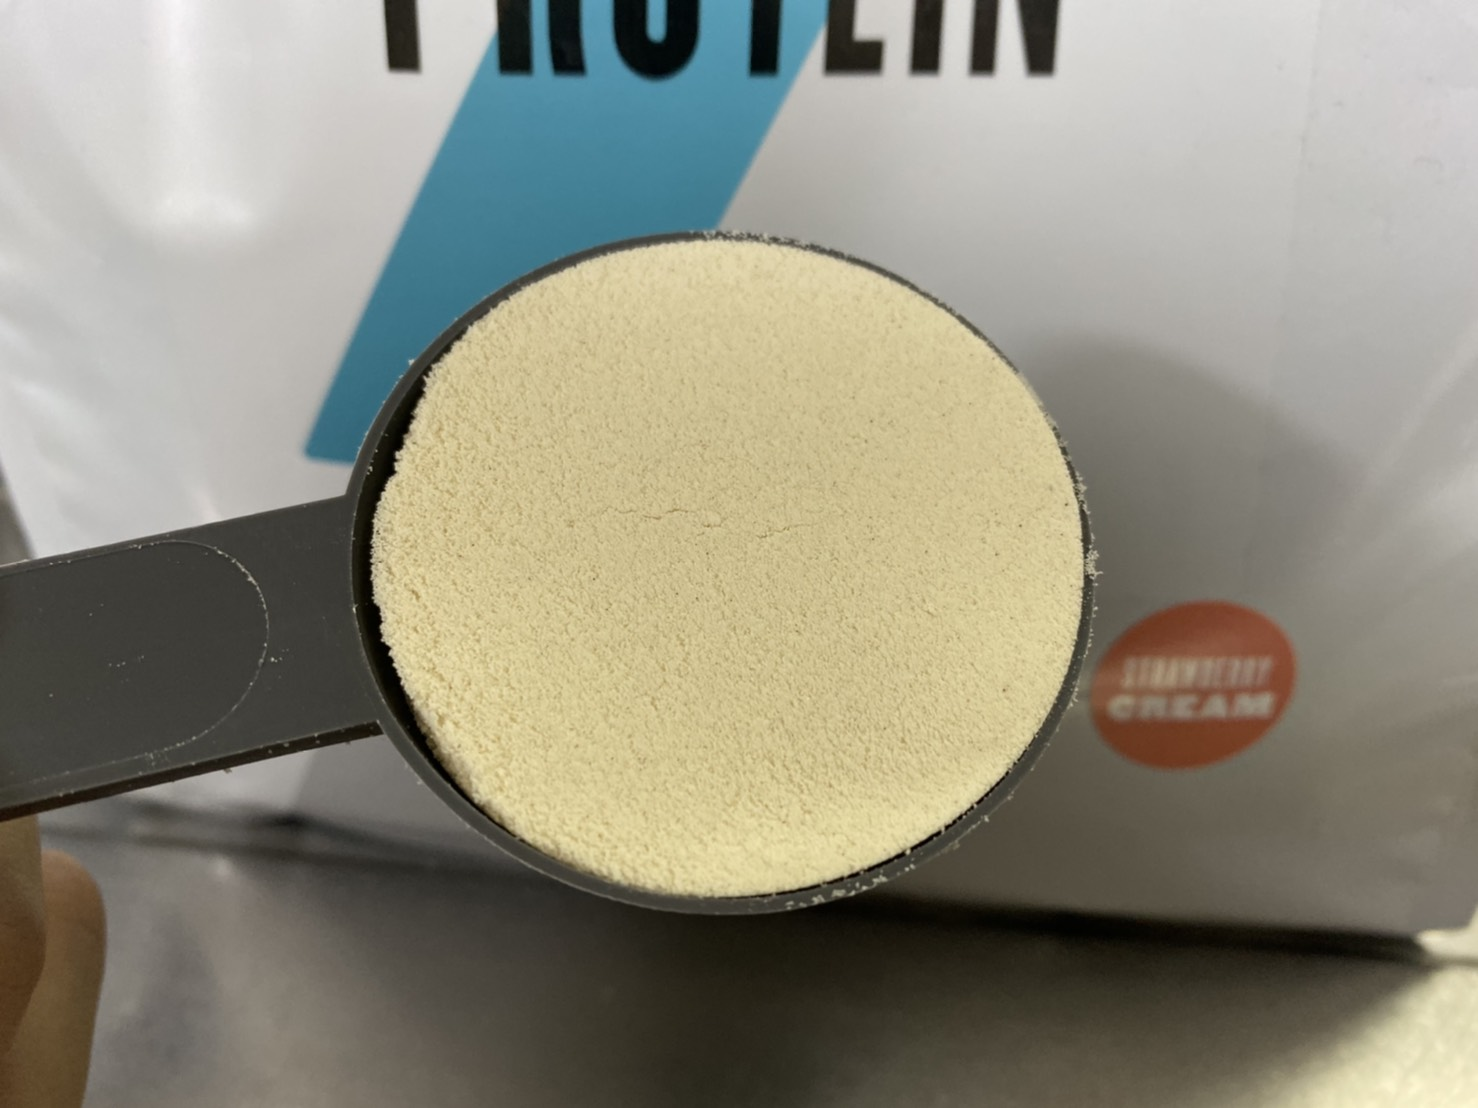 Impactホエイプロテインストロベリークリーム味の粉末